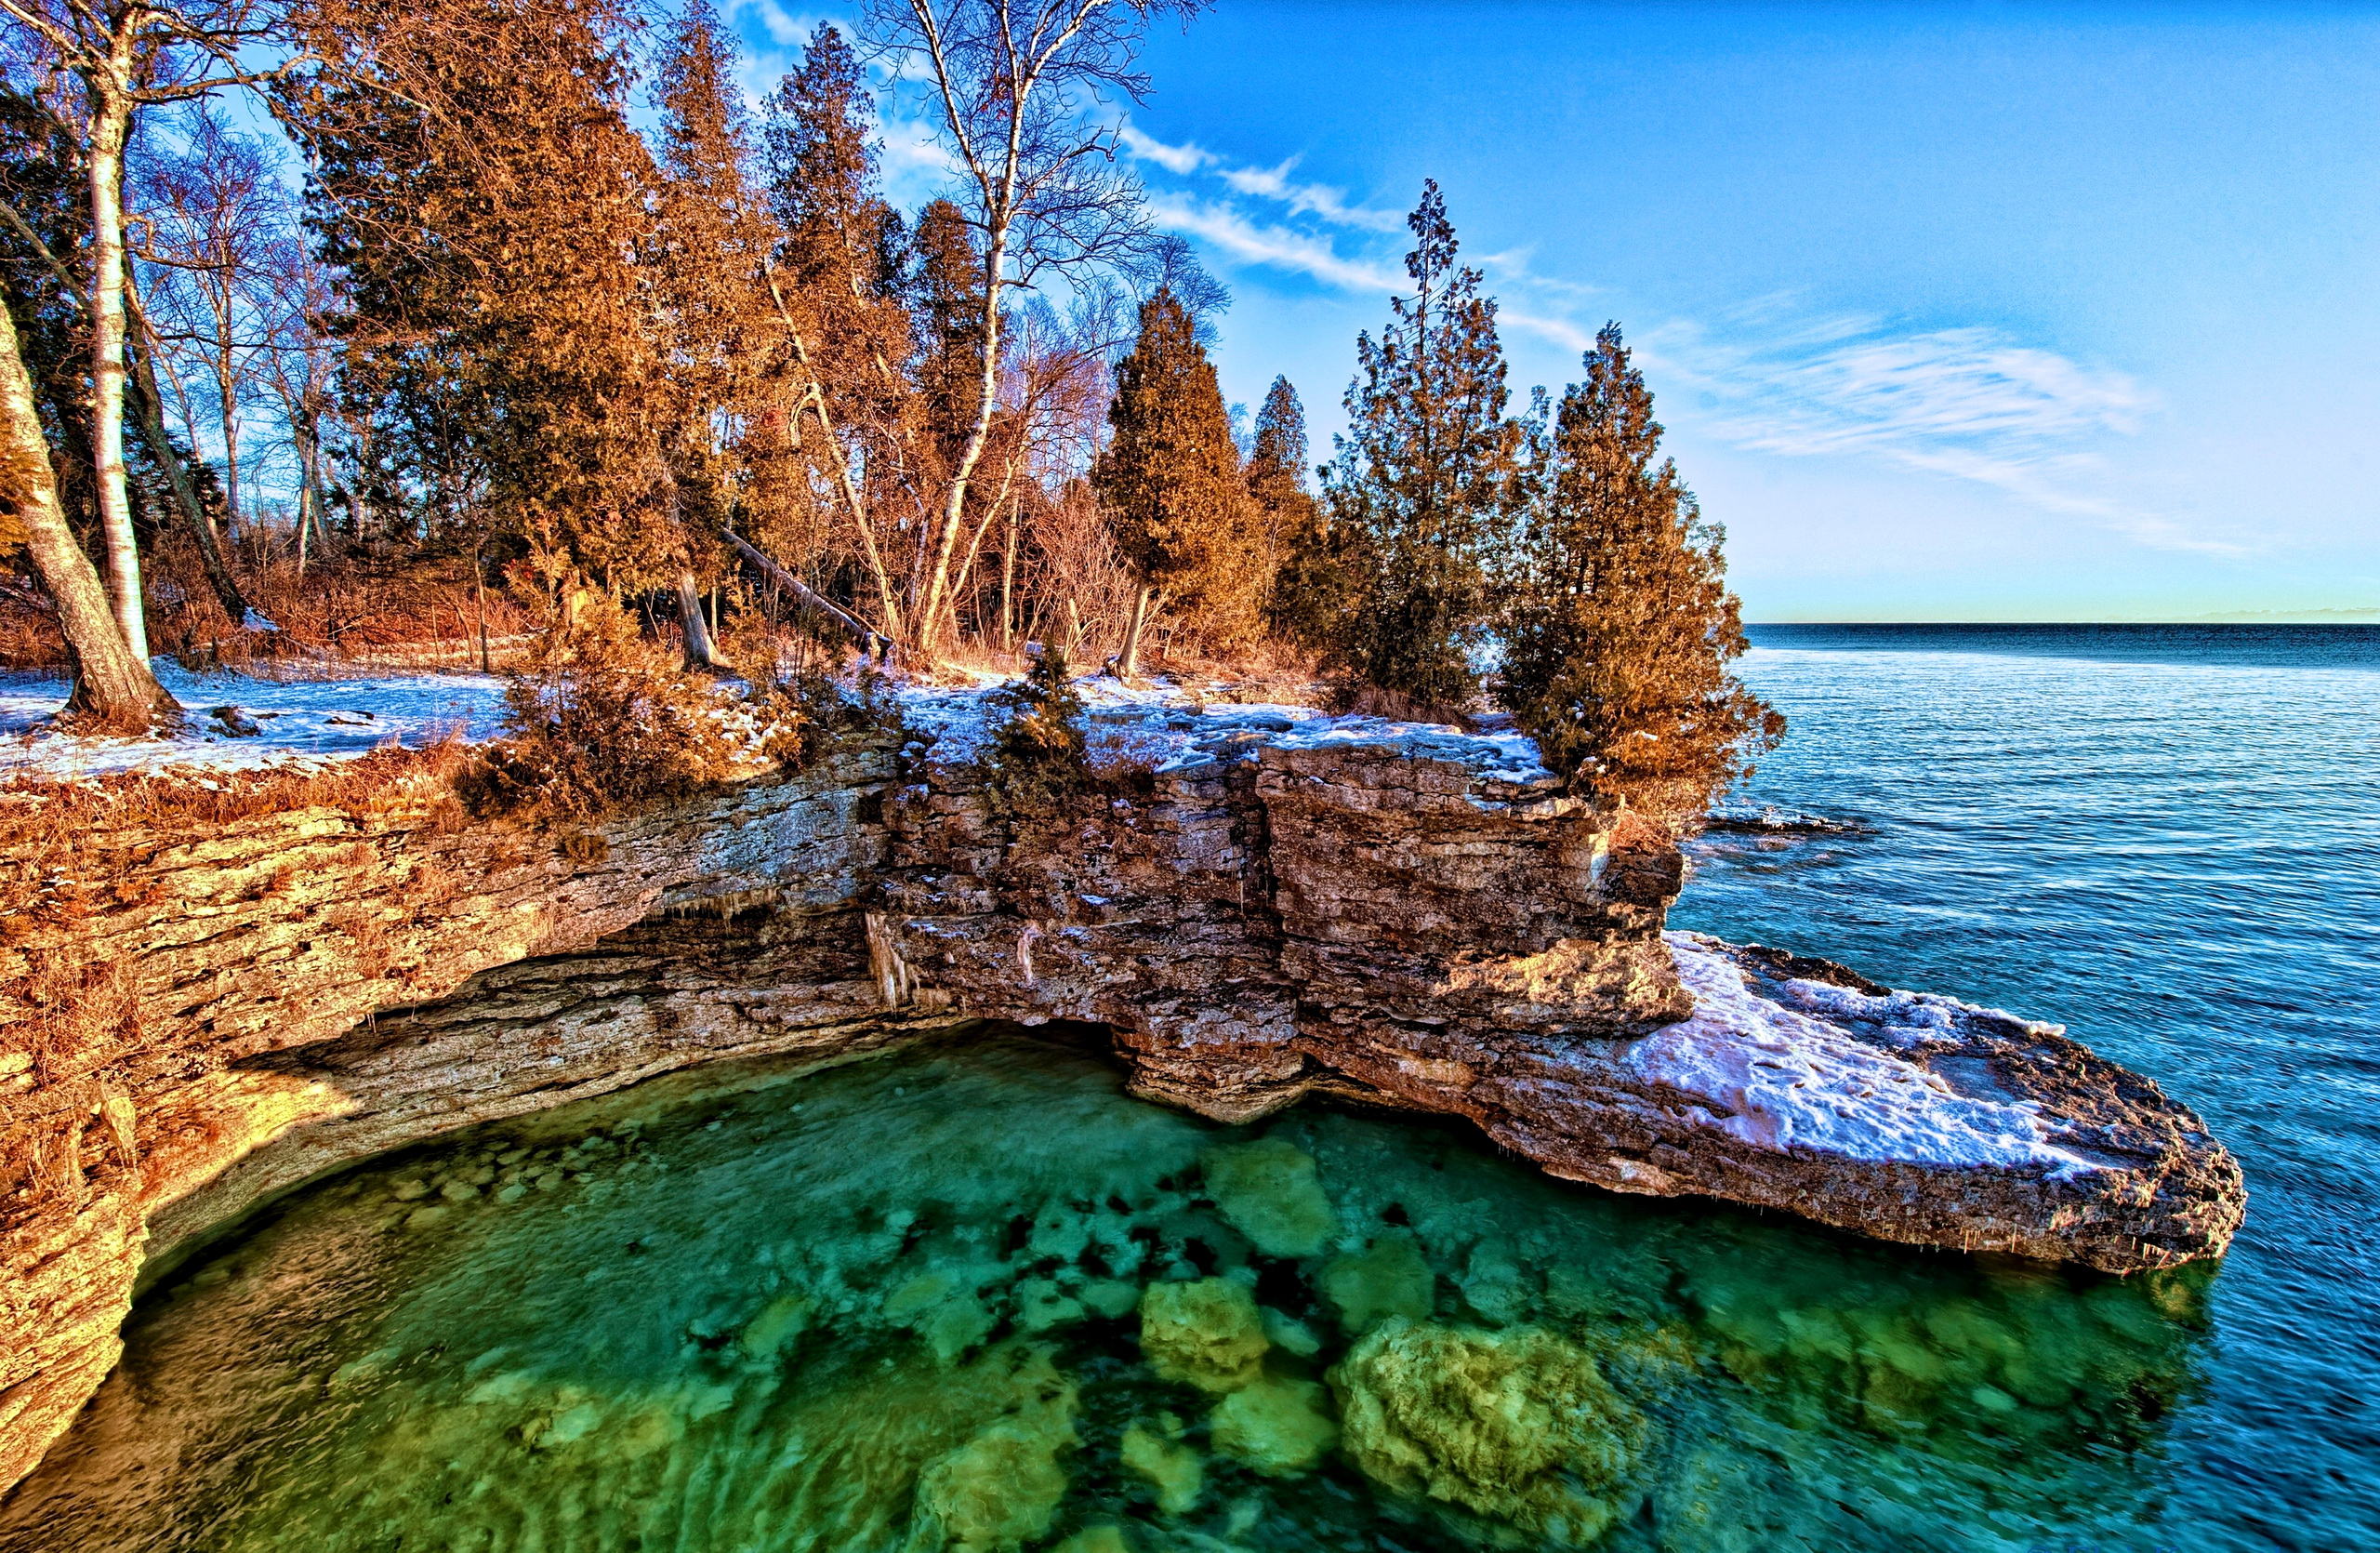 Sunrise Over Lake Michigan 2 by Elvis Kennedy   Desktop Wallpaper 2560x1670